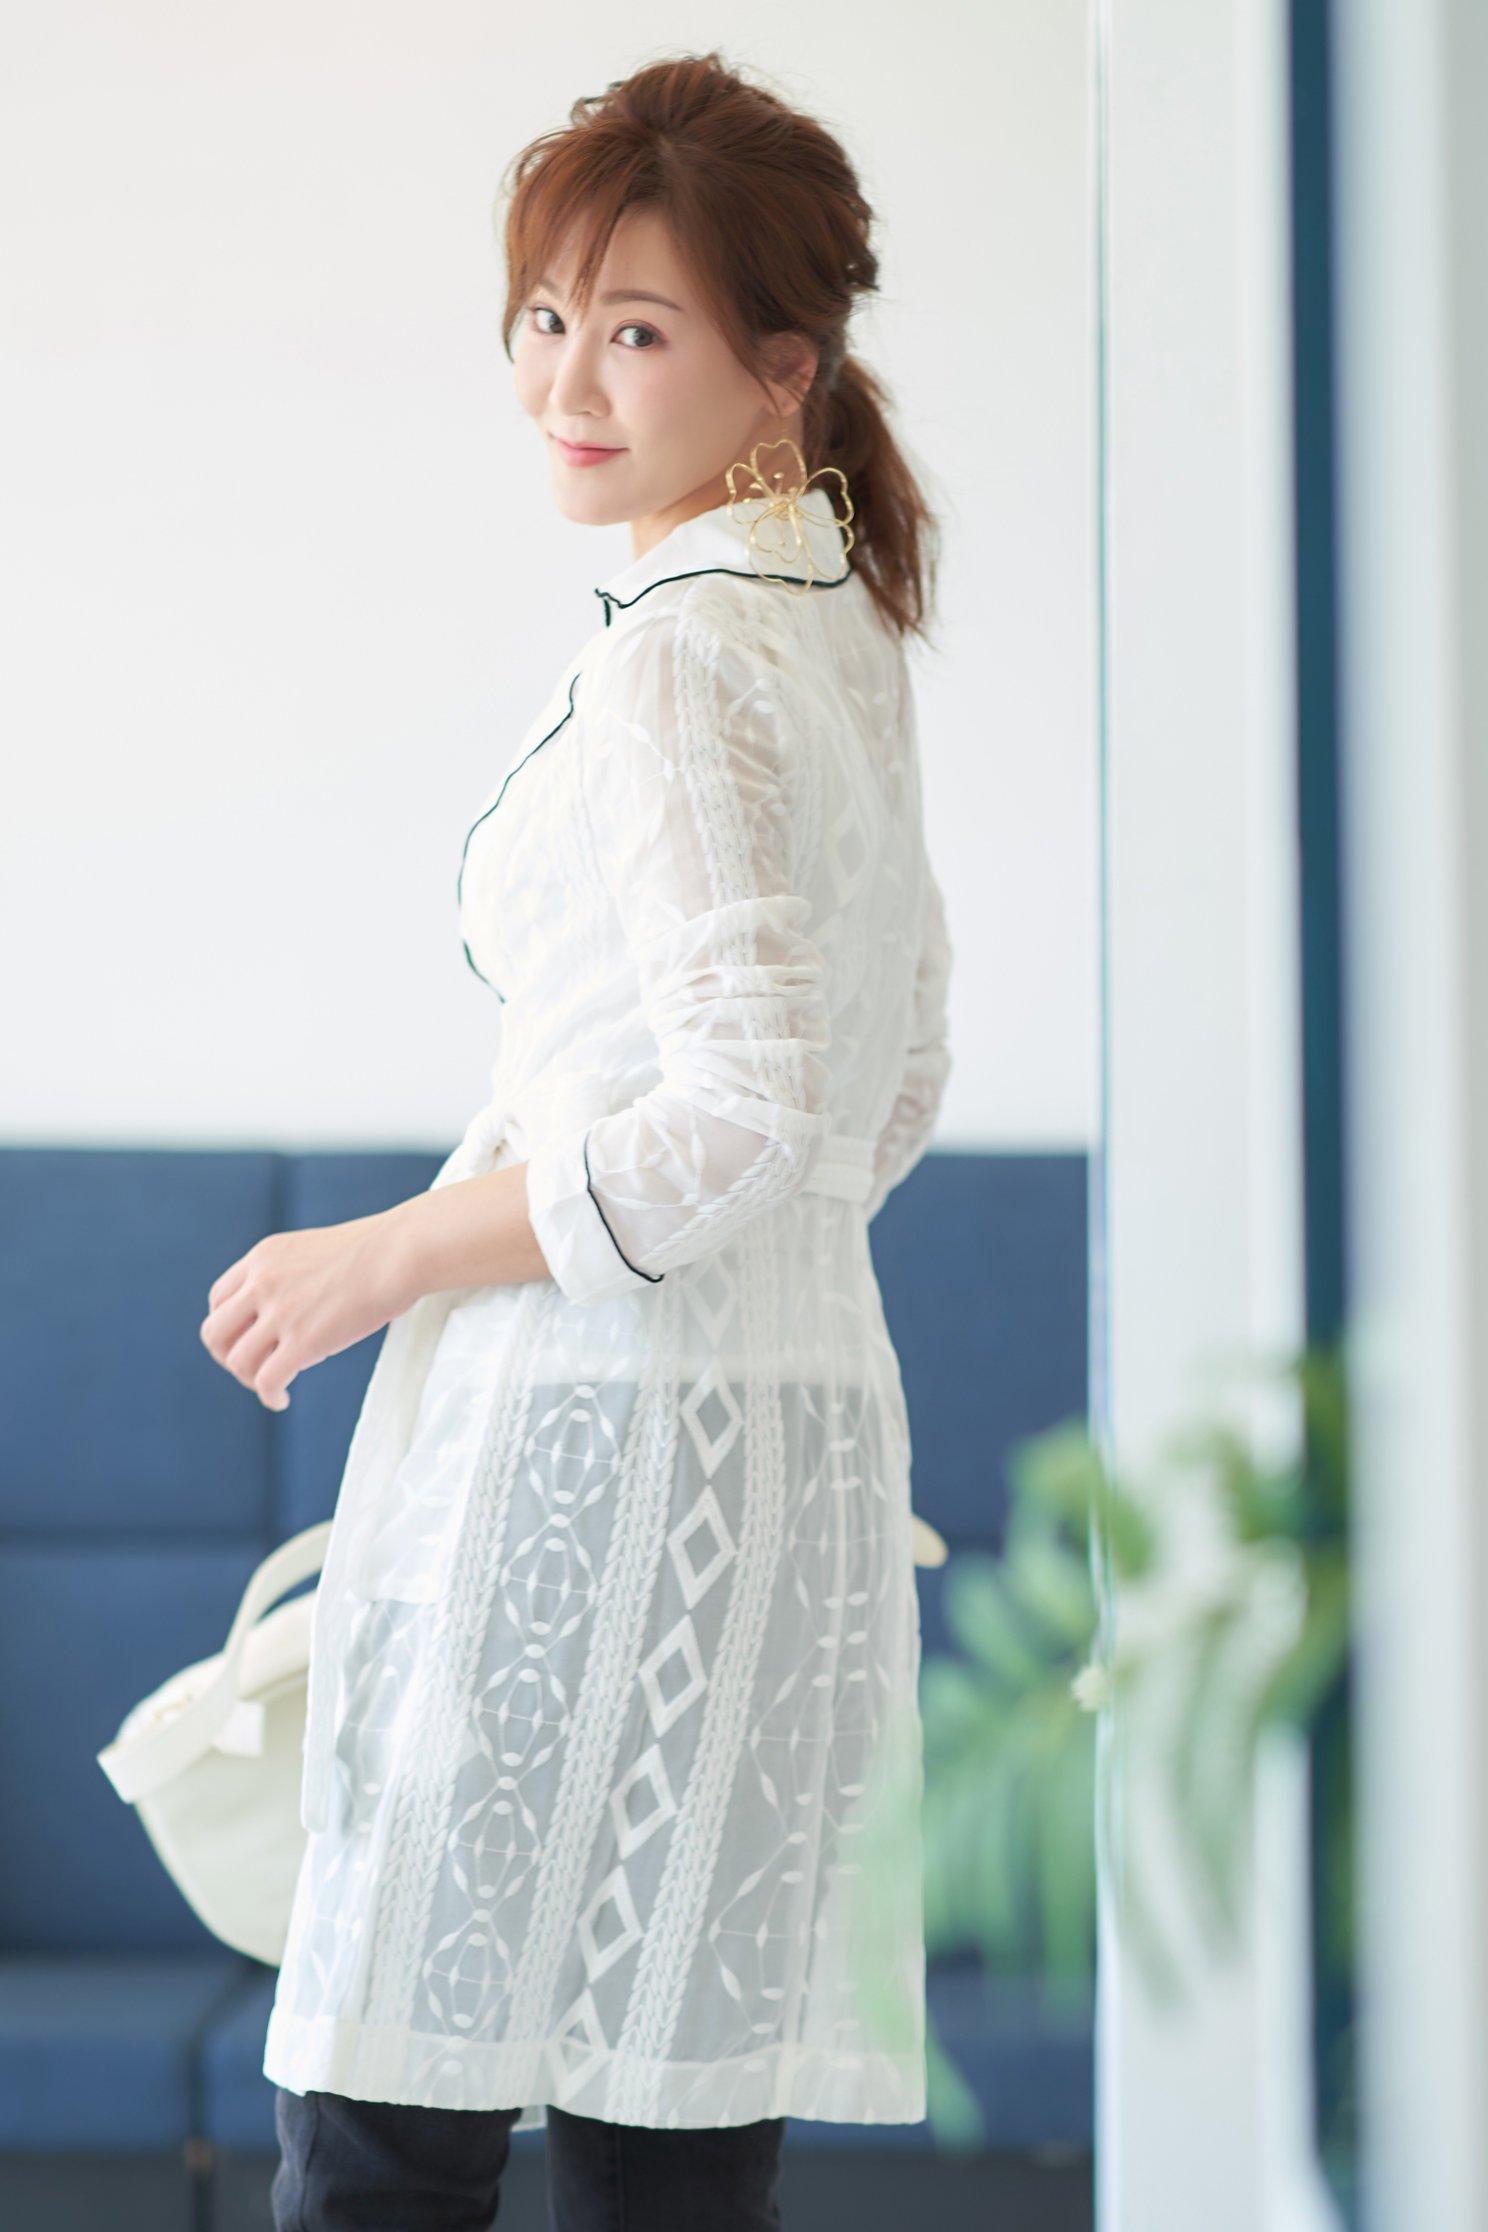 氣質綁帶時尚雕花流行長袖外套,jacket,outerwear,whiteouterwear,valentine,cardigan,longsleevedress